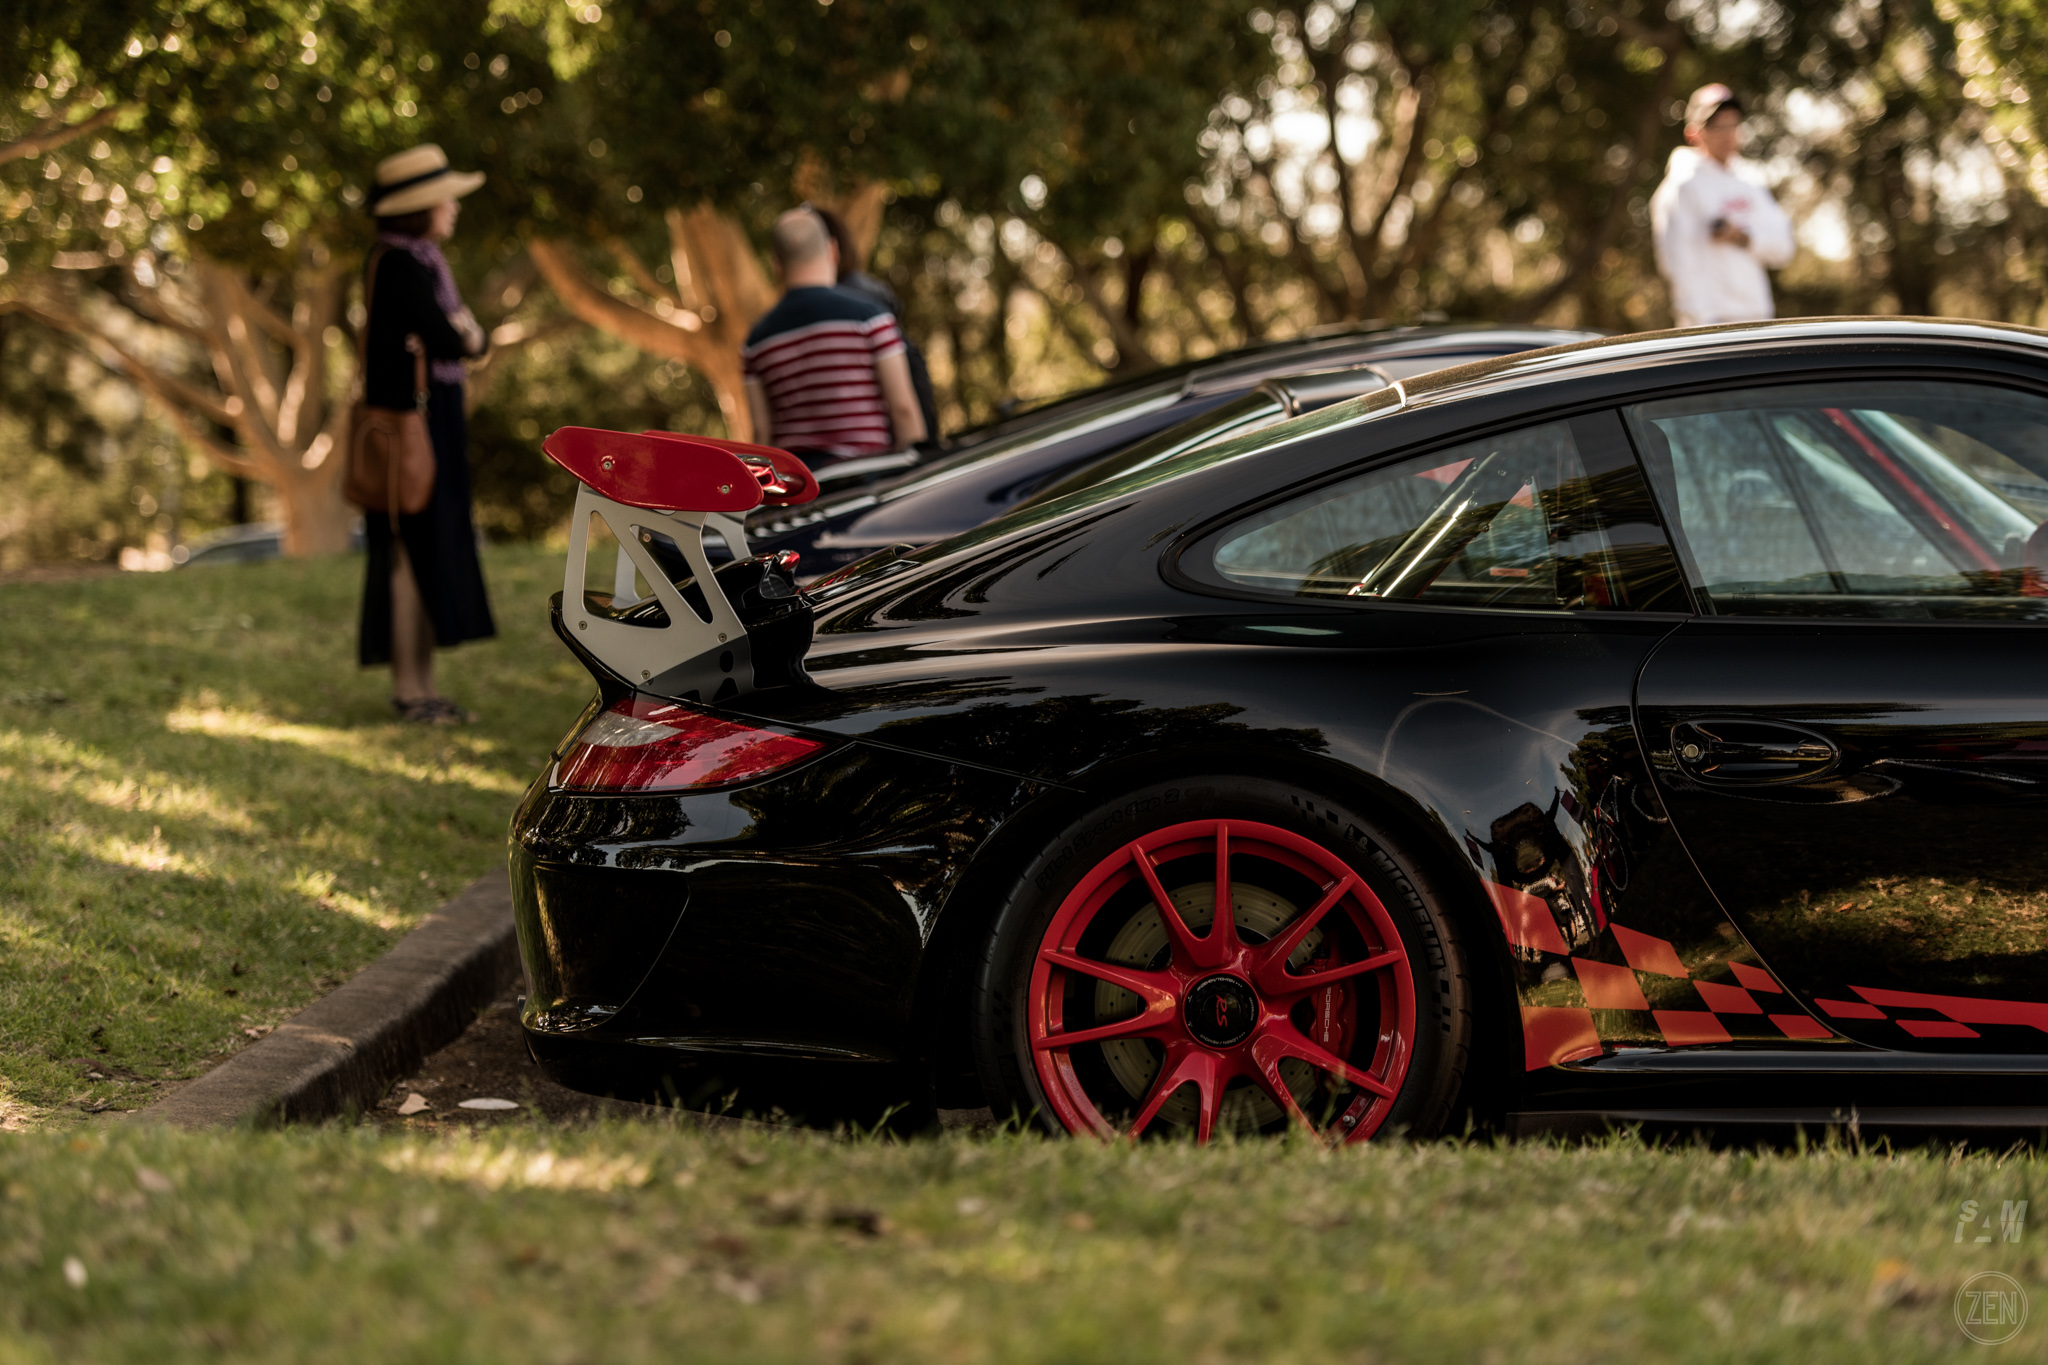 2019-10-27 - Autohaus Porsches & Coffee 149